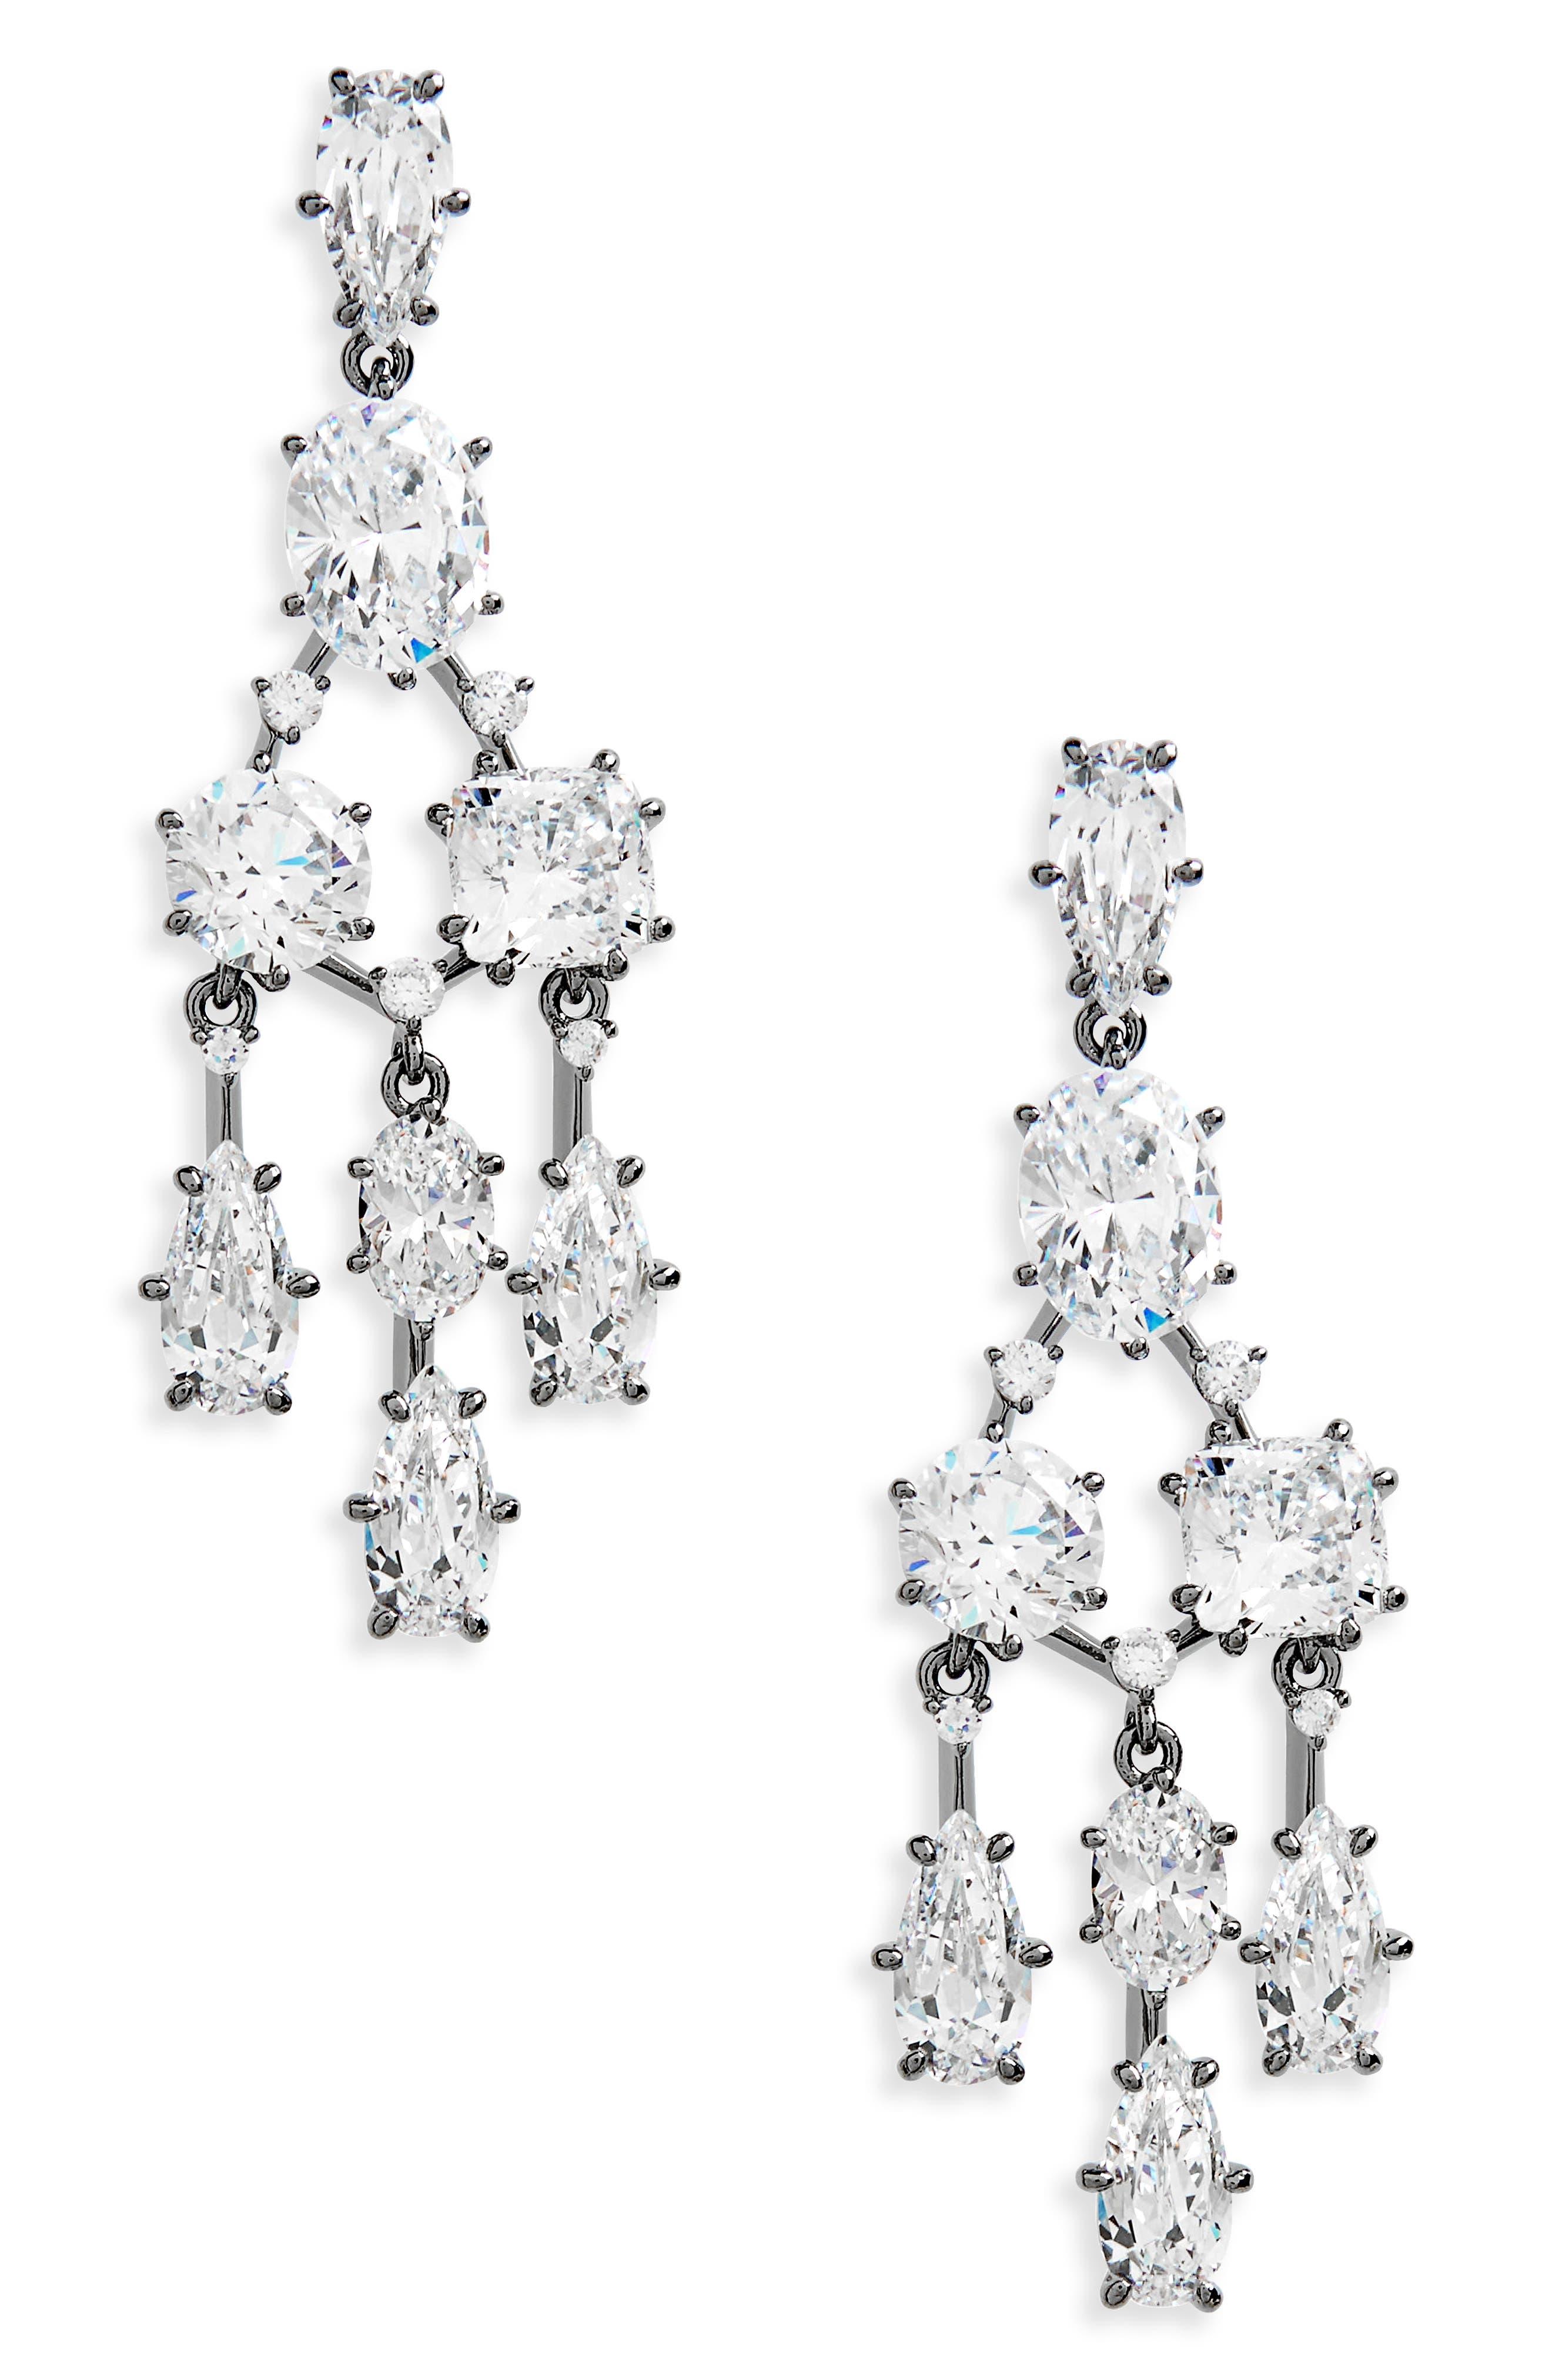 Cubic Zirconia Chandelier Earrings,                         Main,                         color, 001